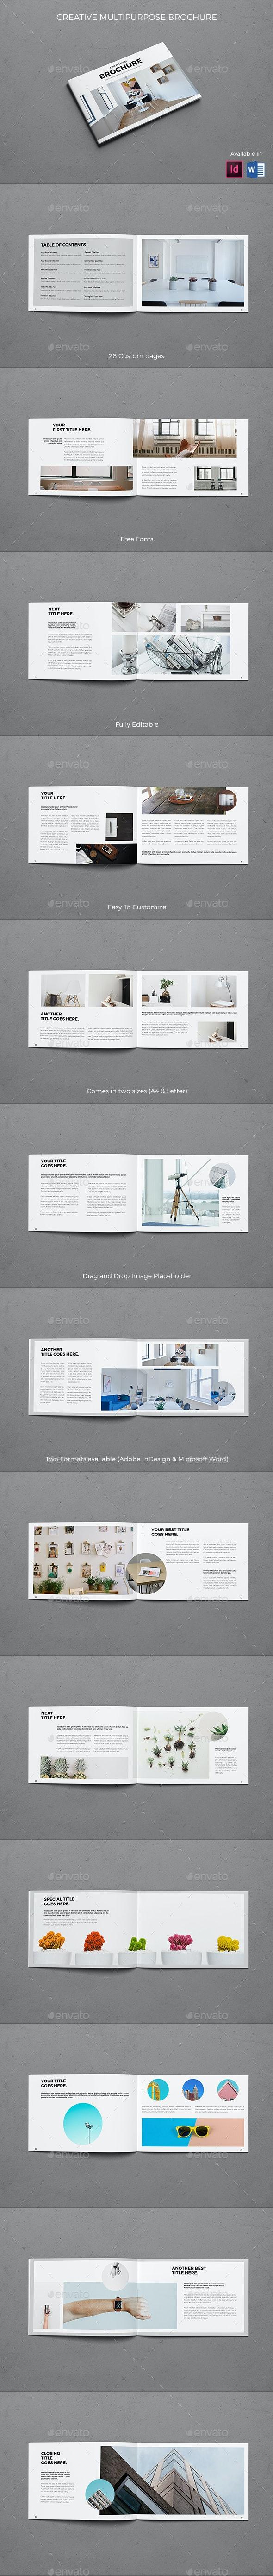 Landscape Creative Multipurpose Brochure - Brochures Print Templates